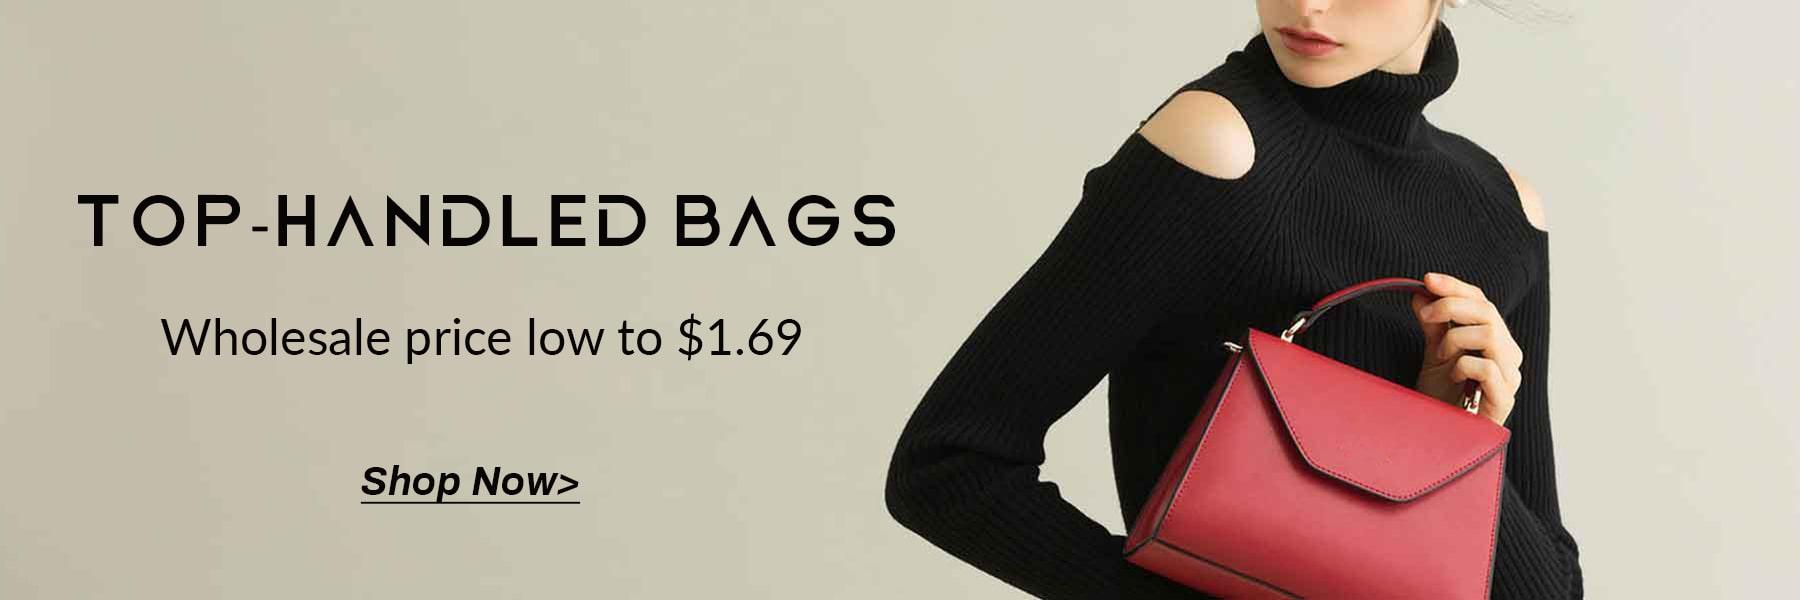 Wholesale Top-Handle Bags